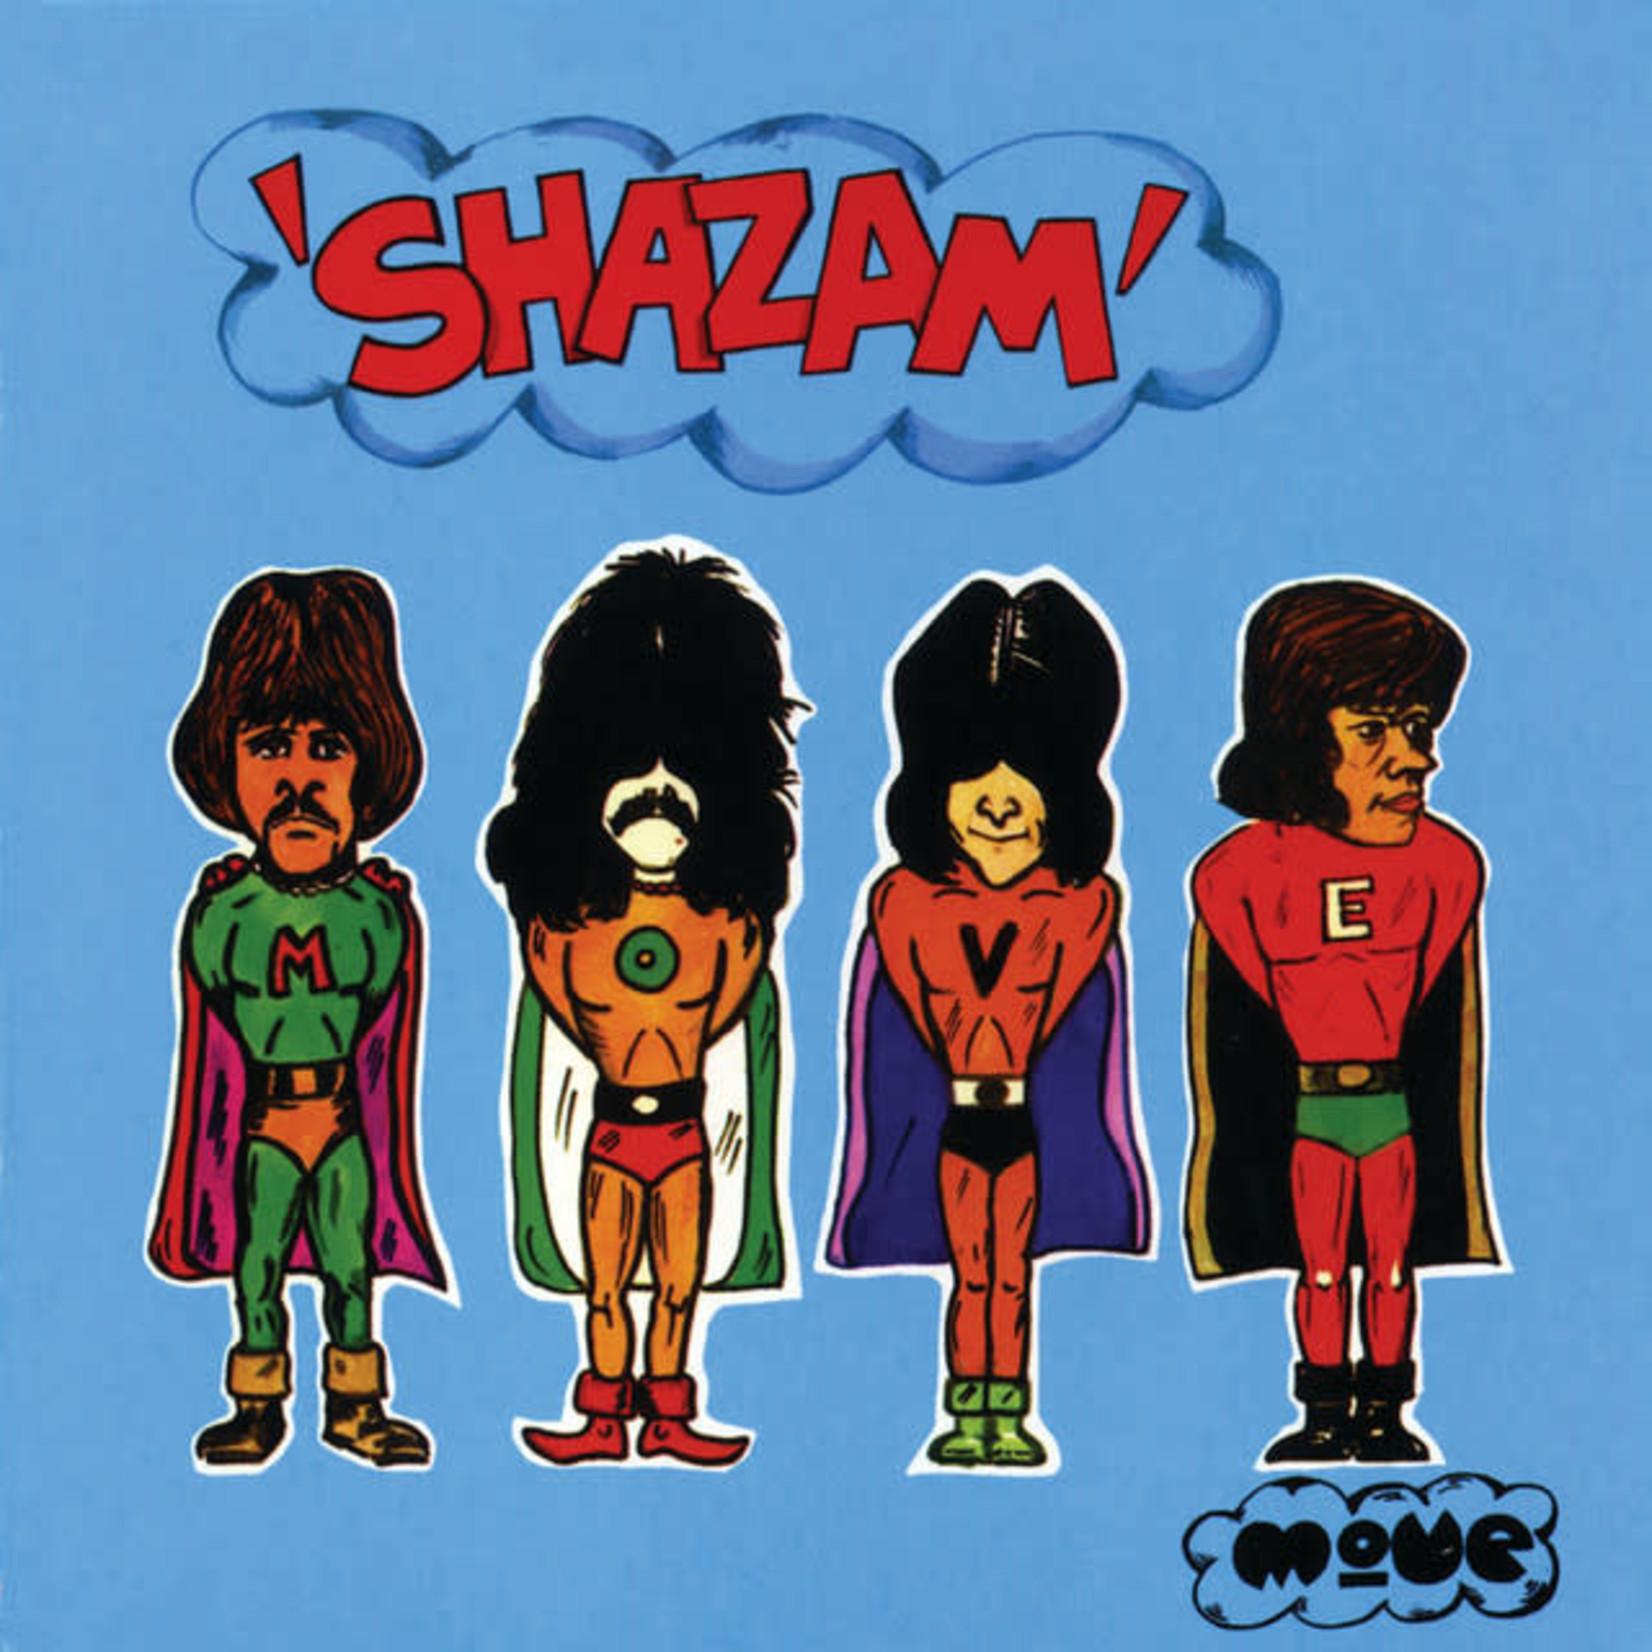 Vinyl The Move - Shazam